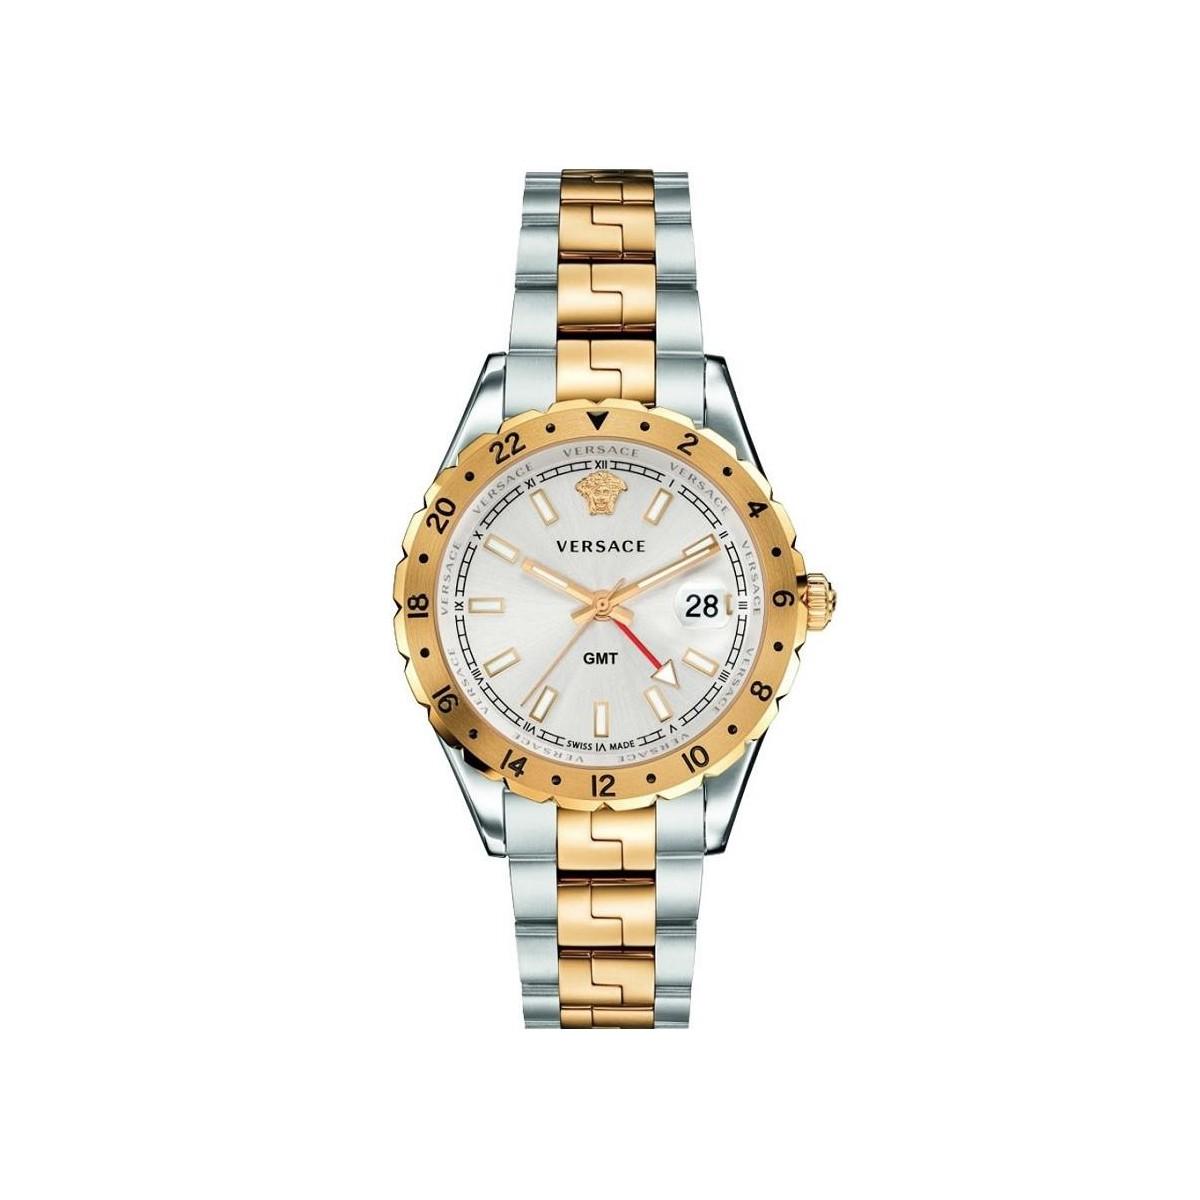 Versace GMT V1103/0015-4916836